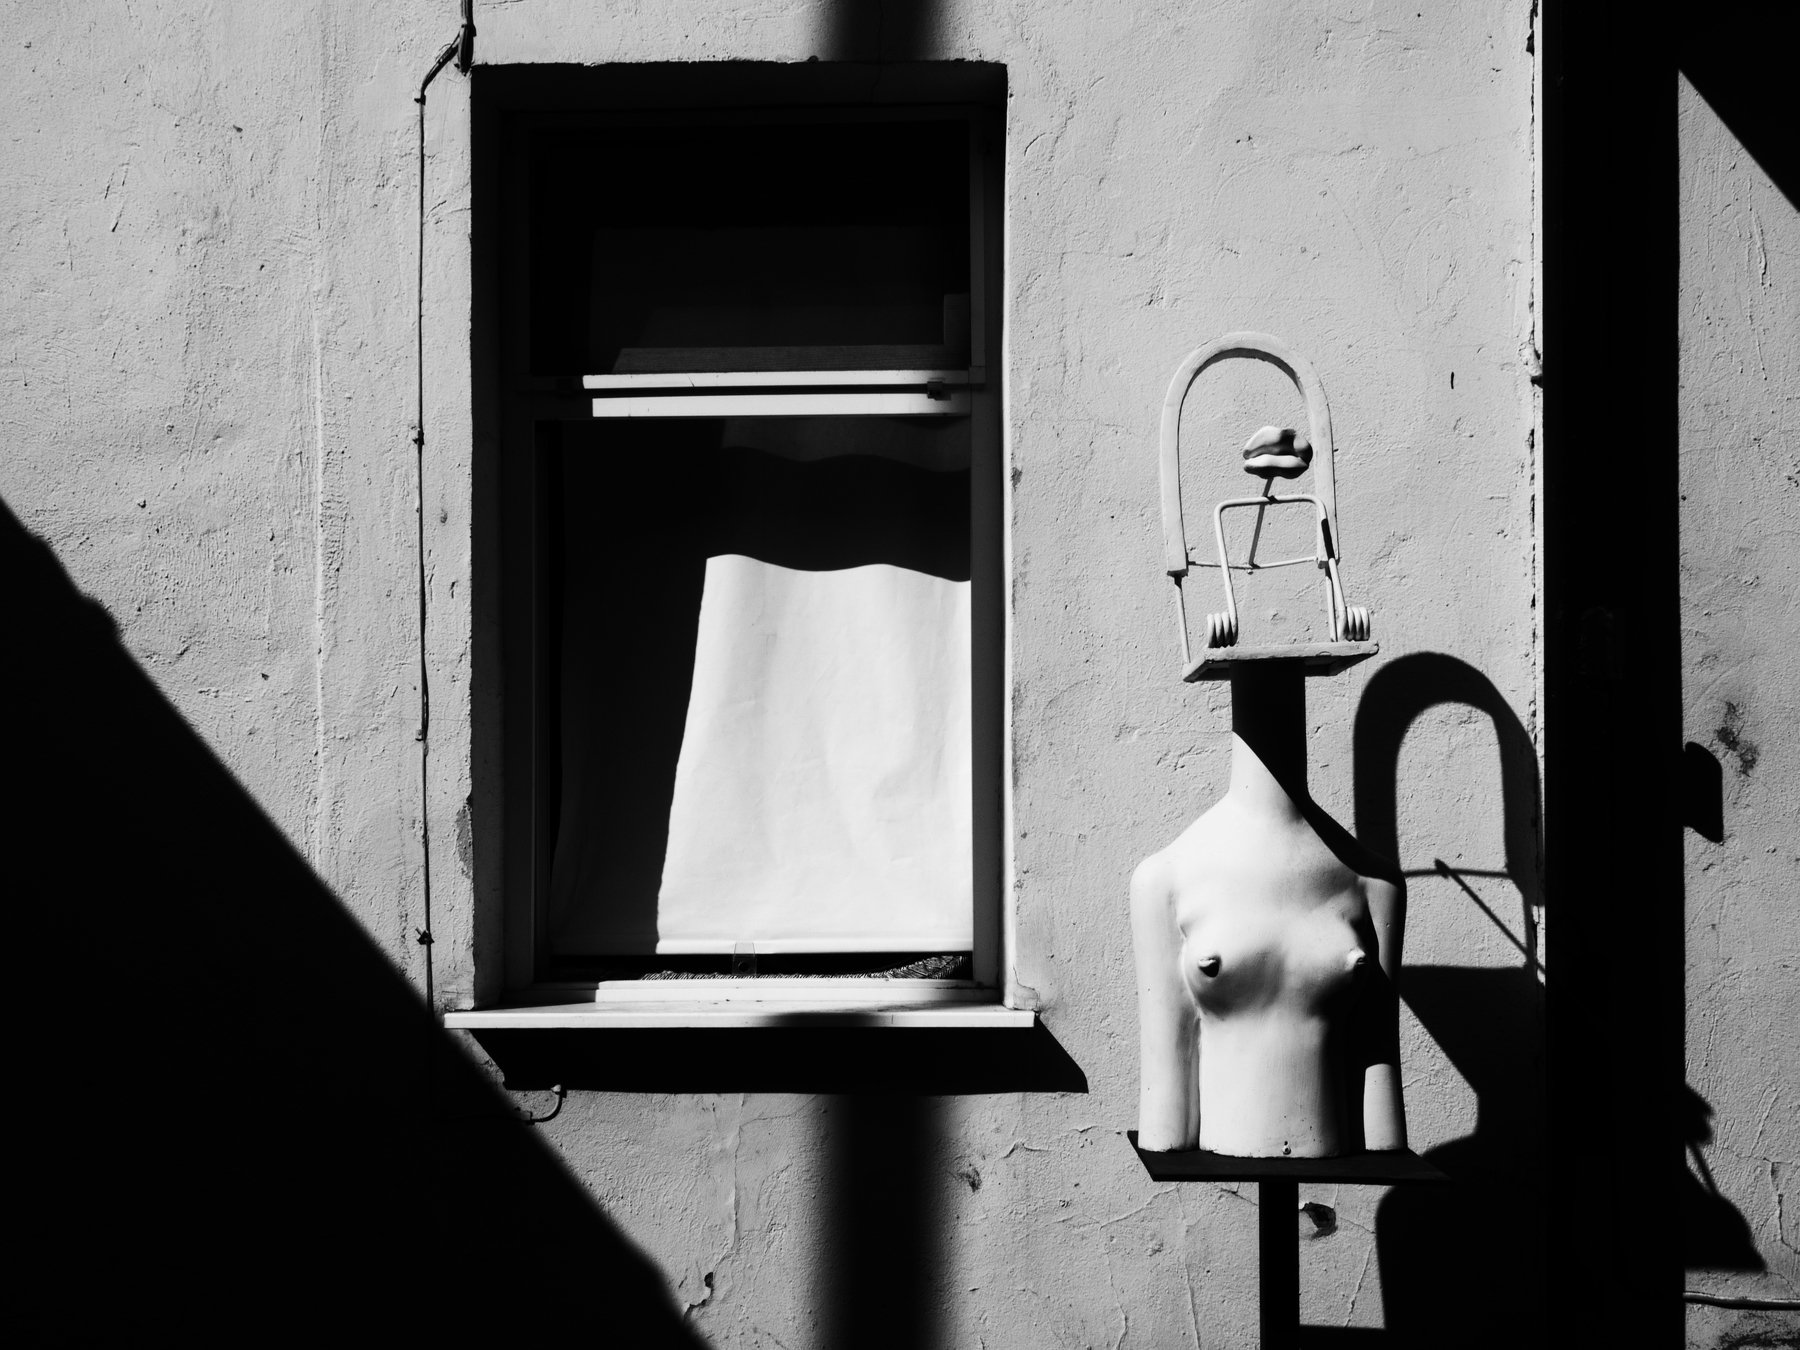 Black and white, Monochrome, Woman, Surreal, Surrealism, Museum, Moscow, Russia, Elena Beregatnova